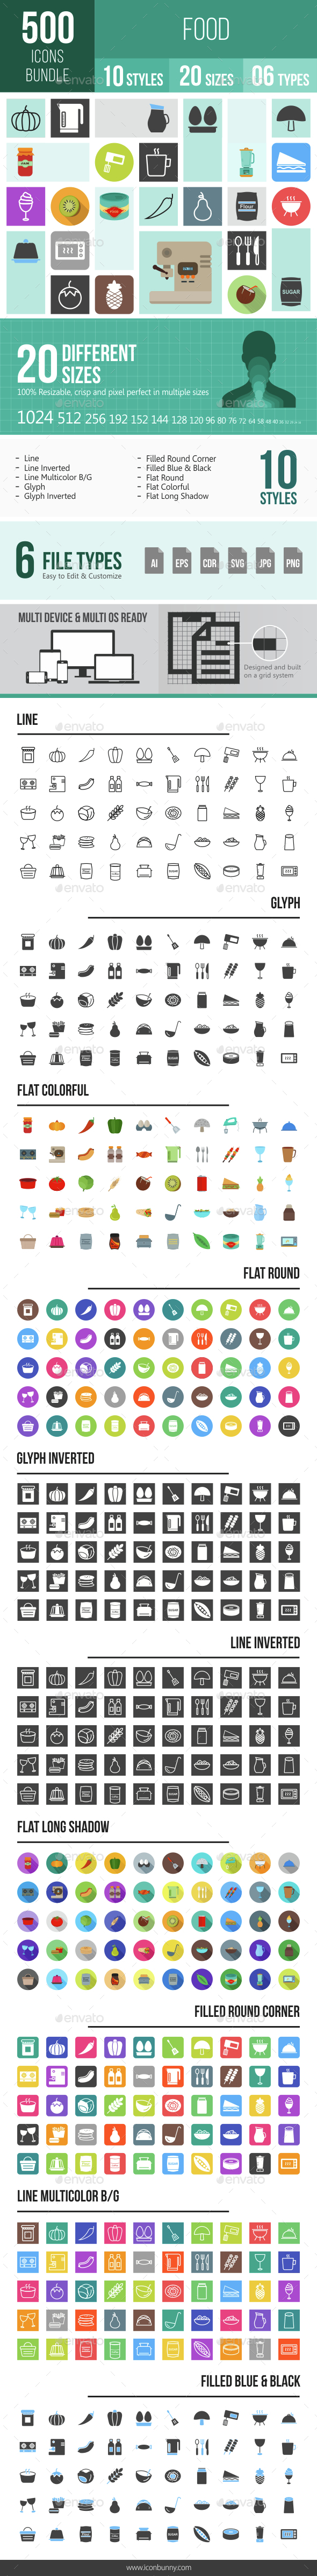 500 Food Icons Bundle - Icons